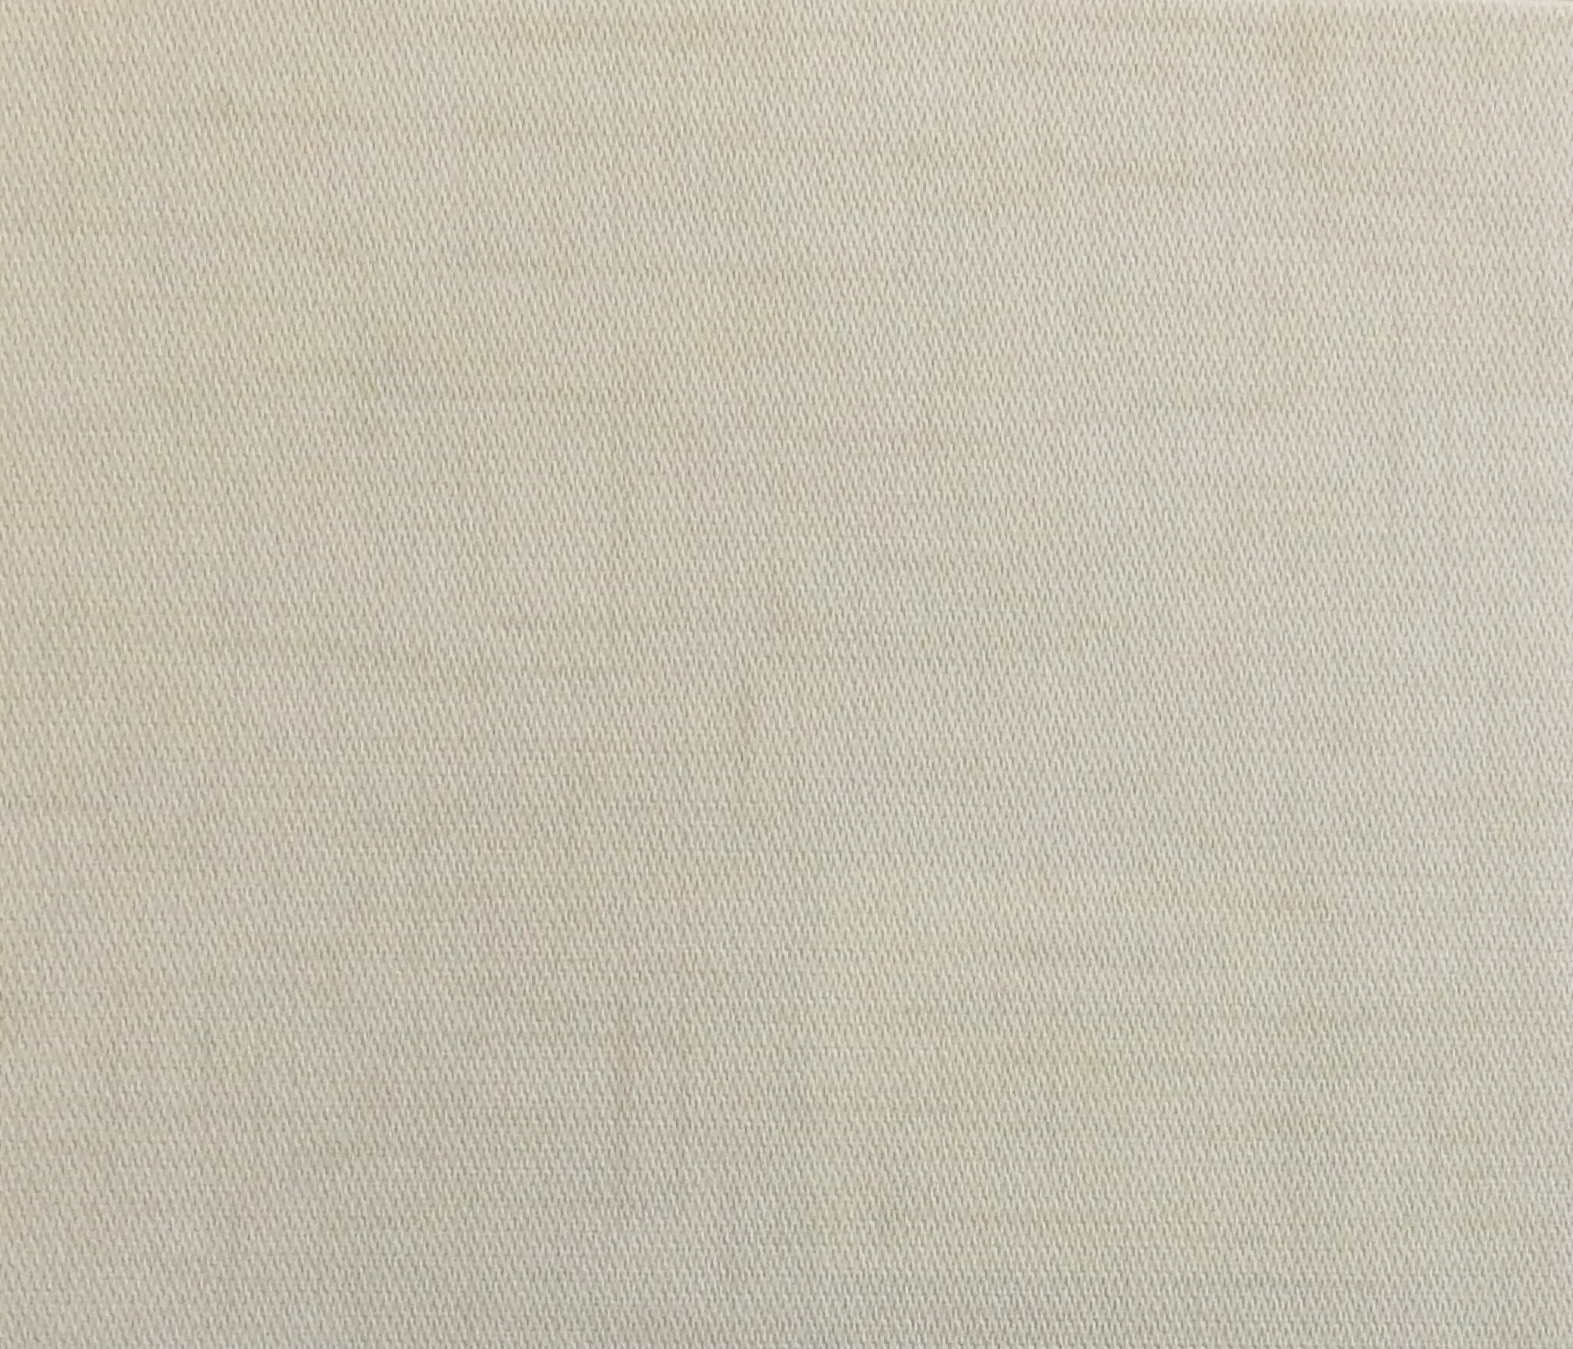 Spectrum Vintage White Blind Sample Fabric